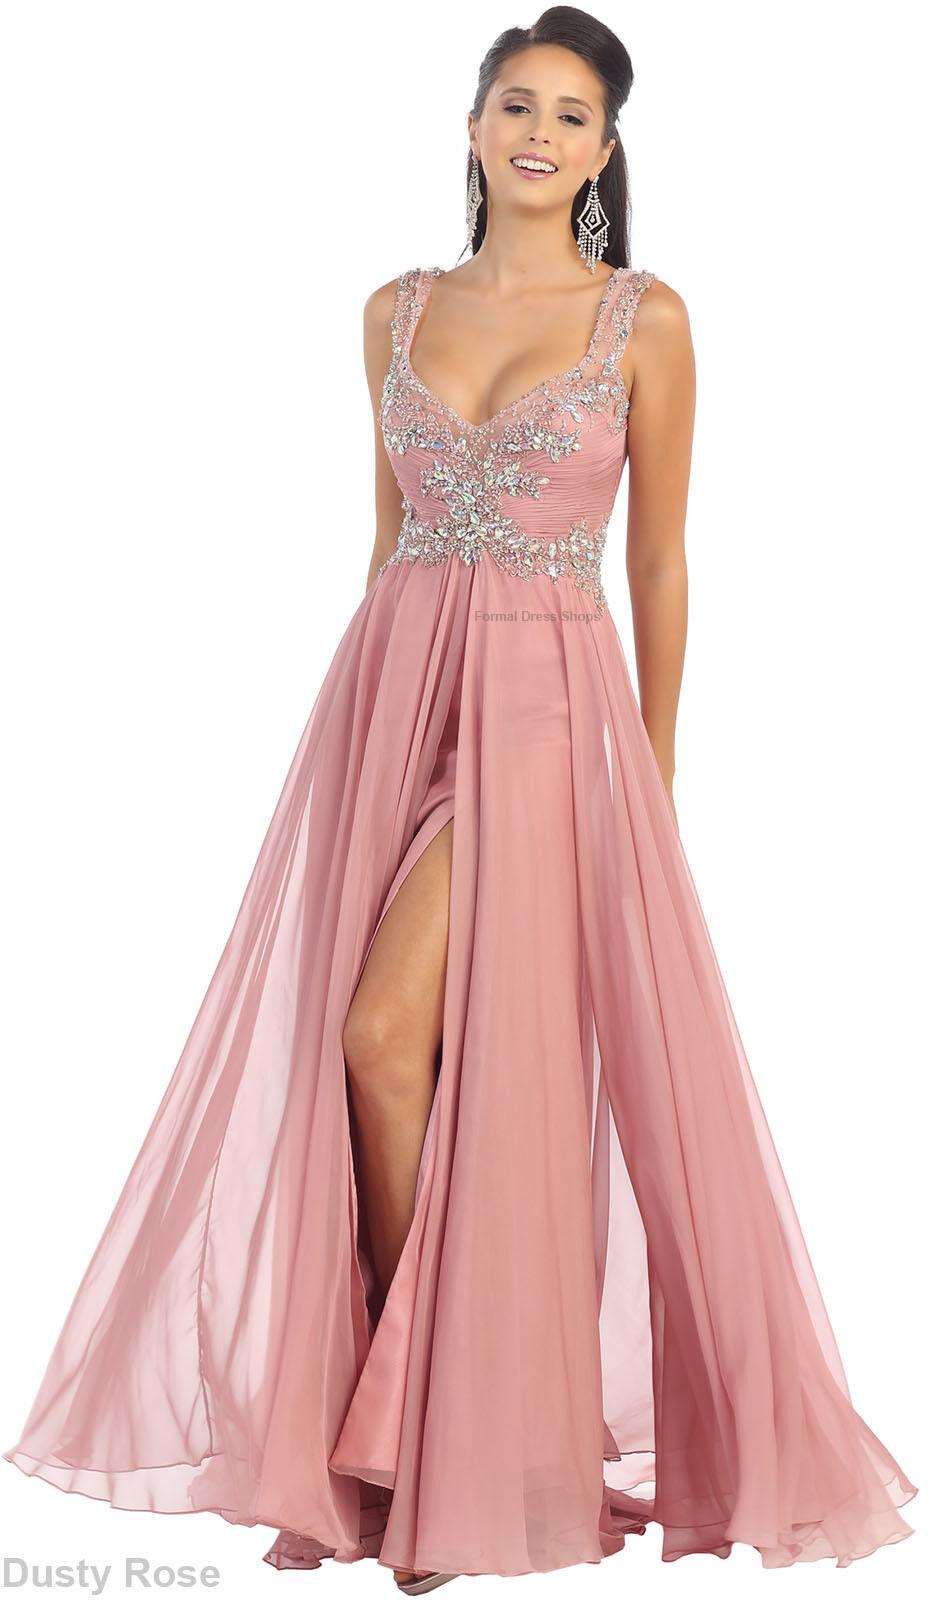 New Flowy Long Dress Formal Dance Party Classy Evening -8701